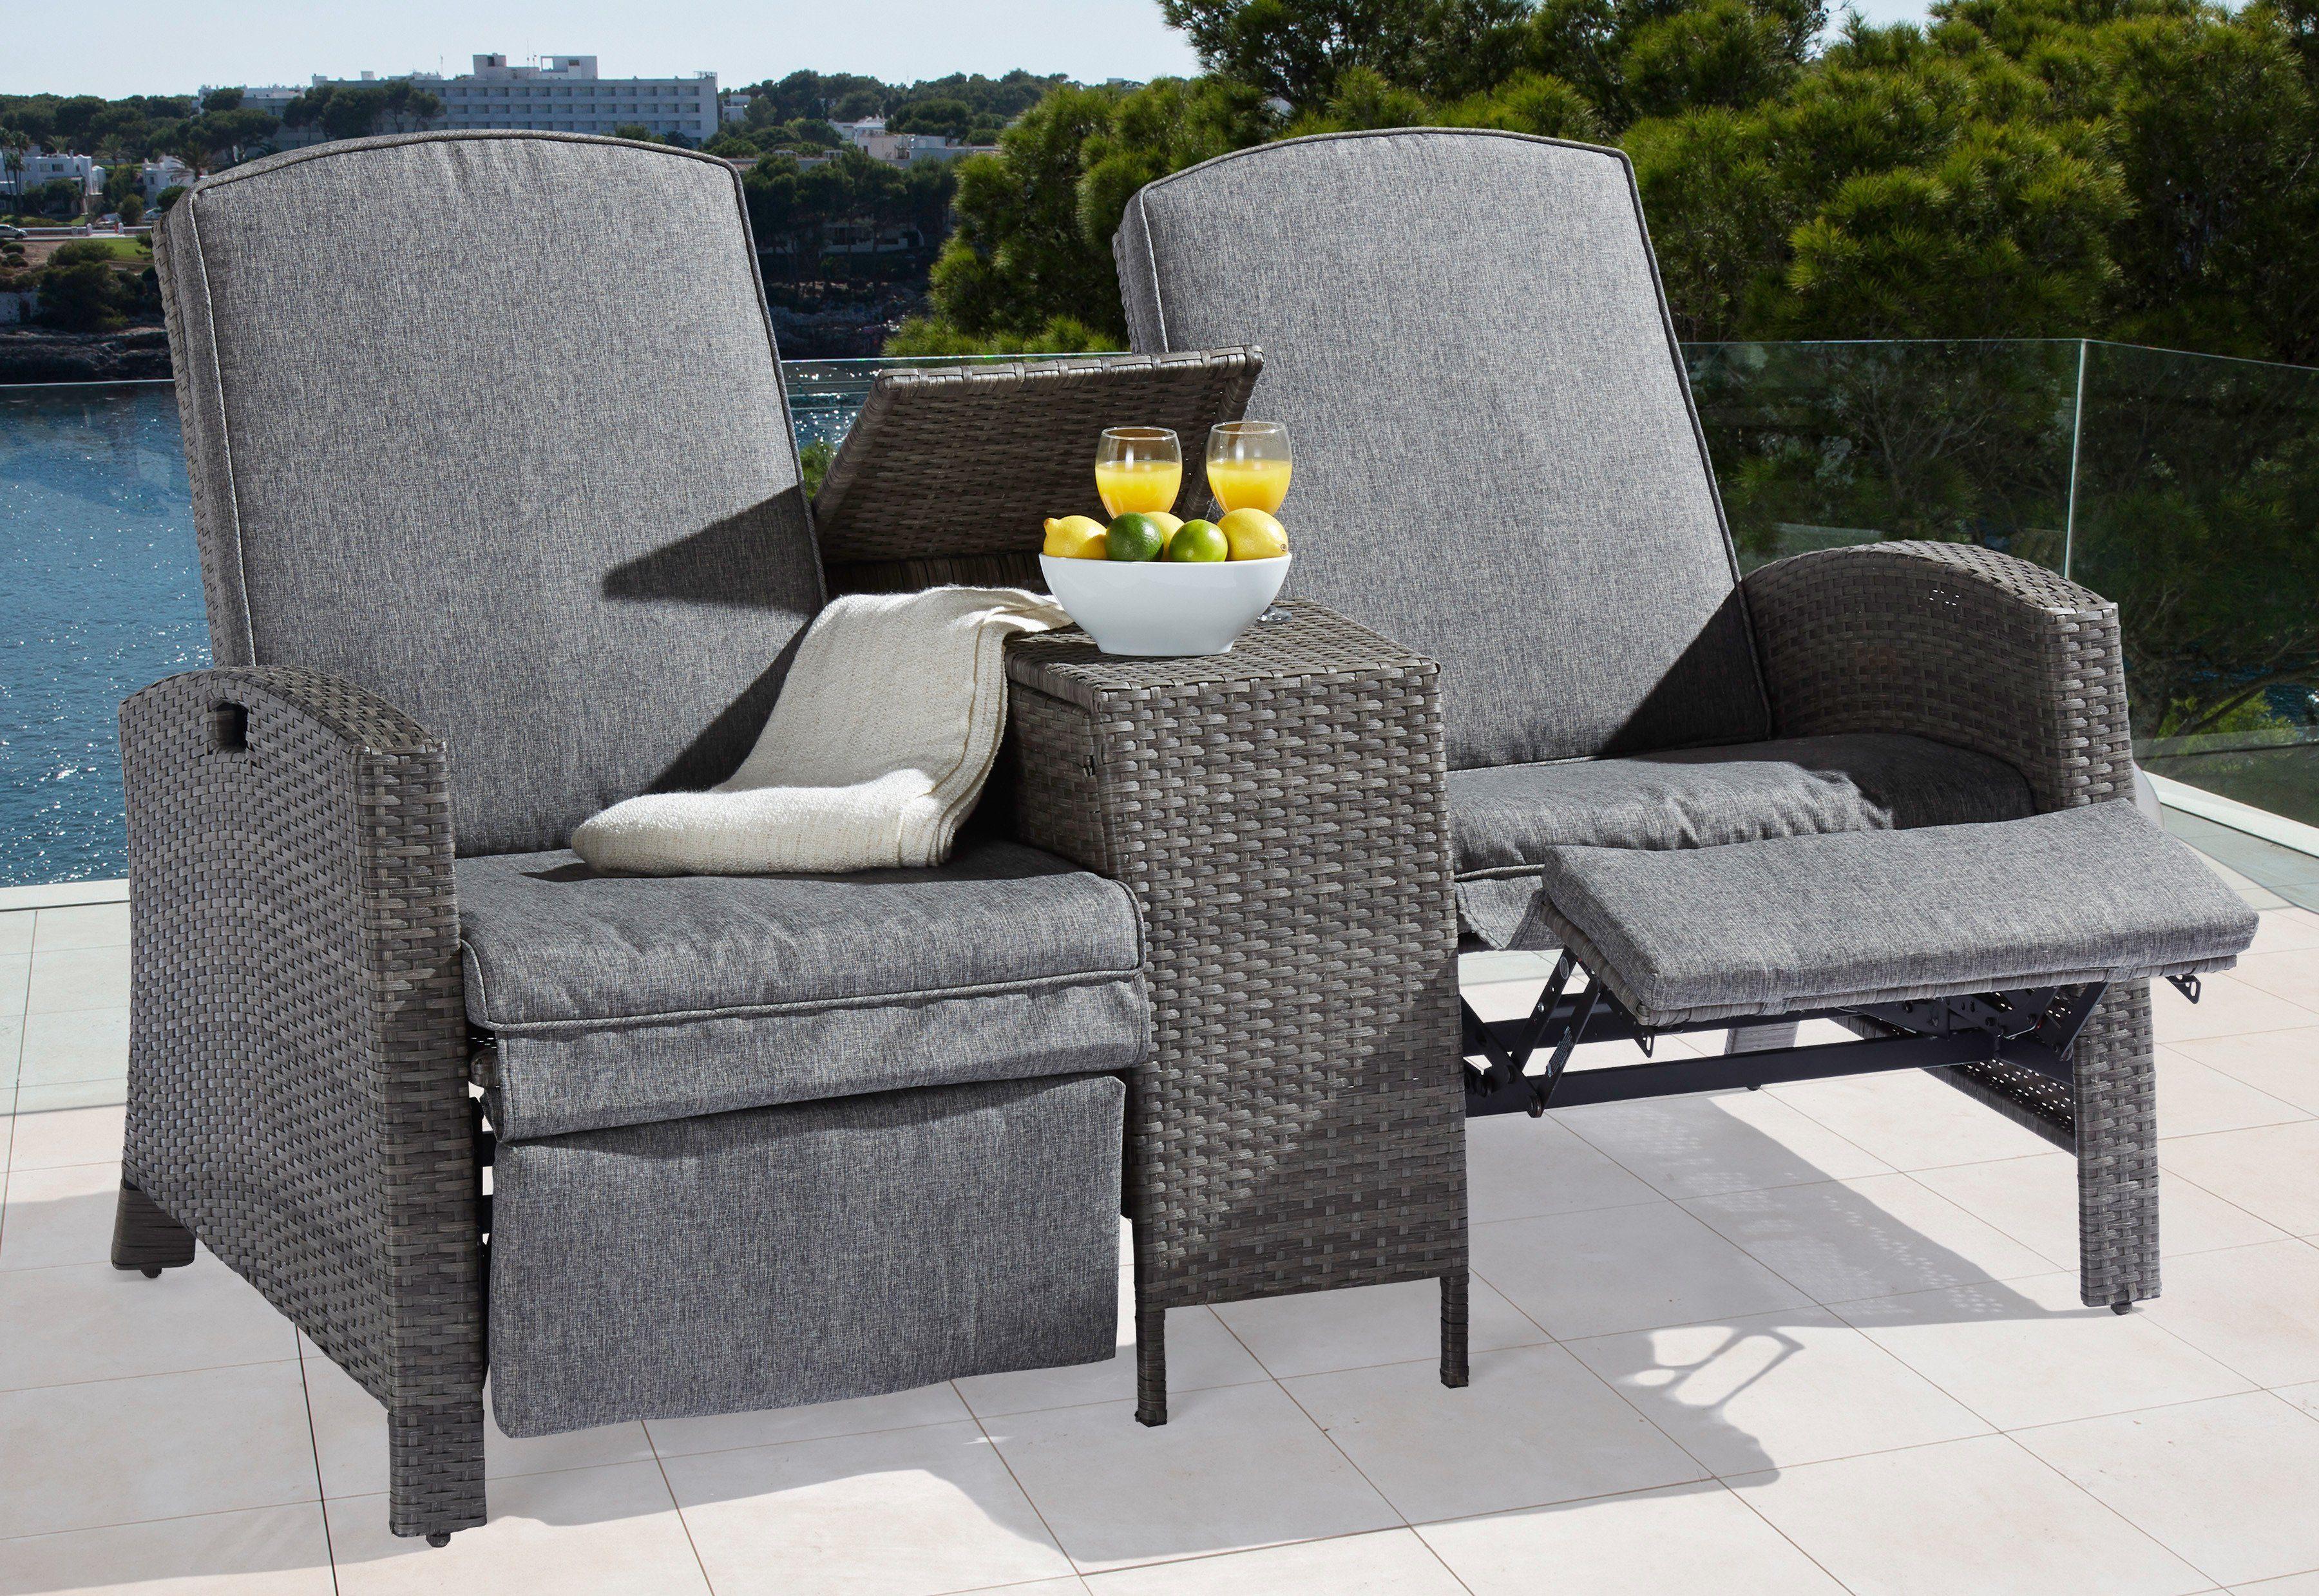 Gartengut Gartenbank »Relax«, Polyrattan, inkl. Auflagen, verstellbar, grau